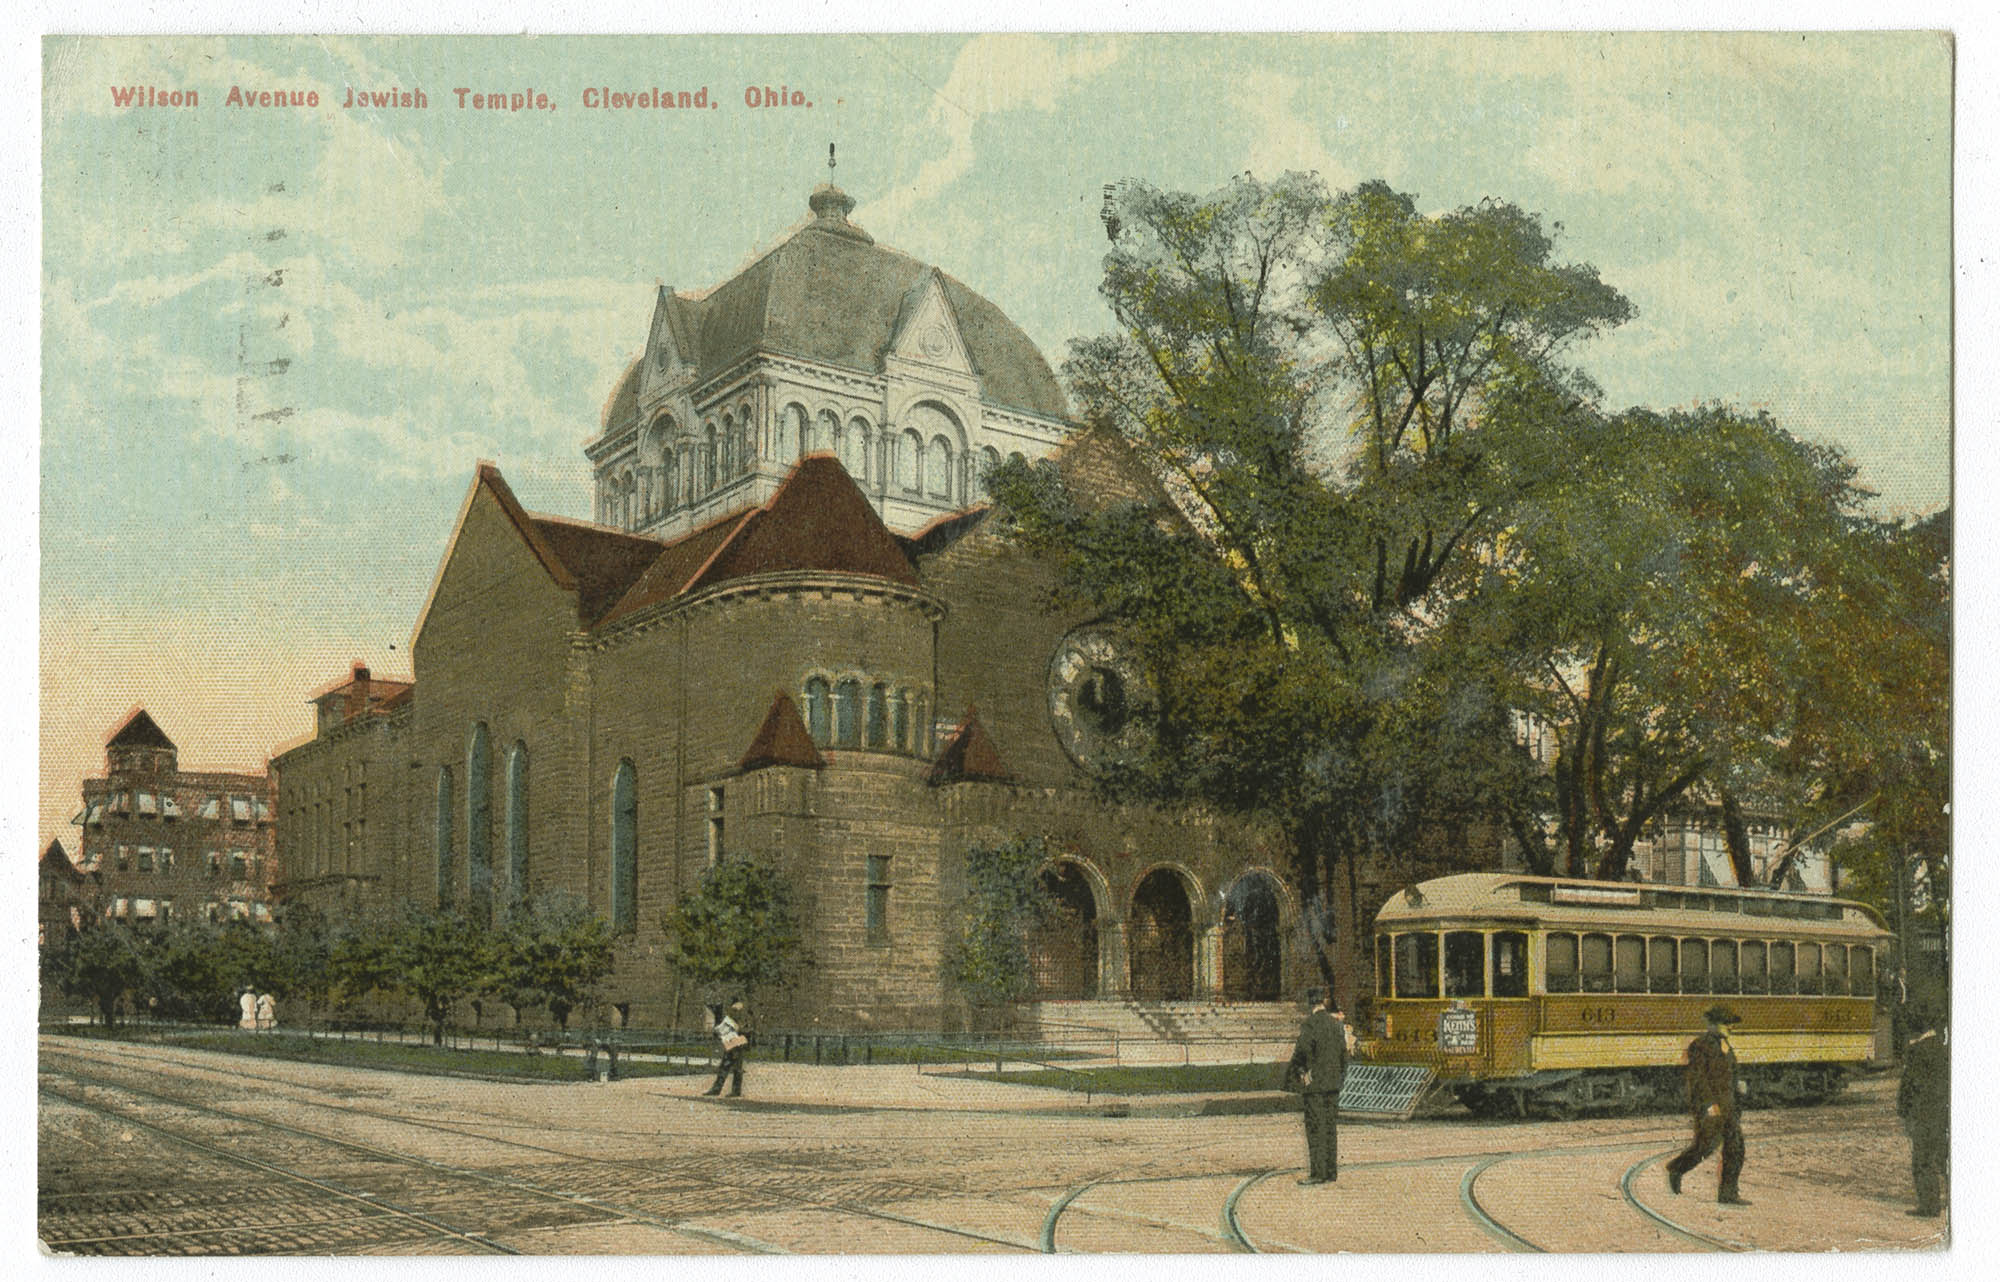 Wilson Avenue Jewish Temple, Cleveland, Ohio